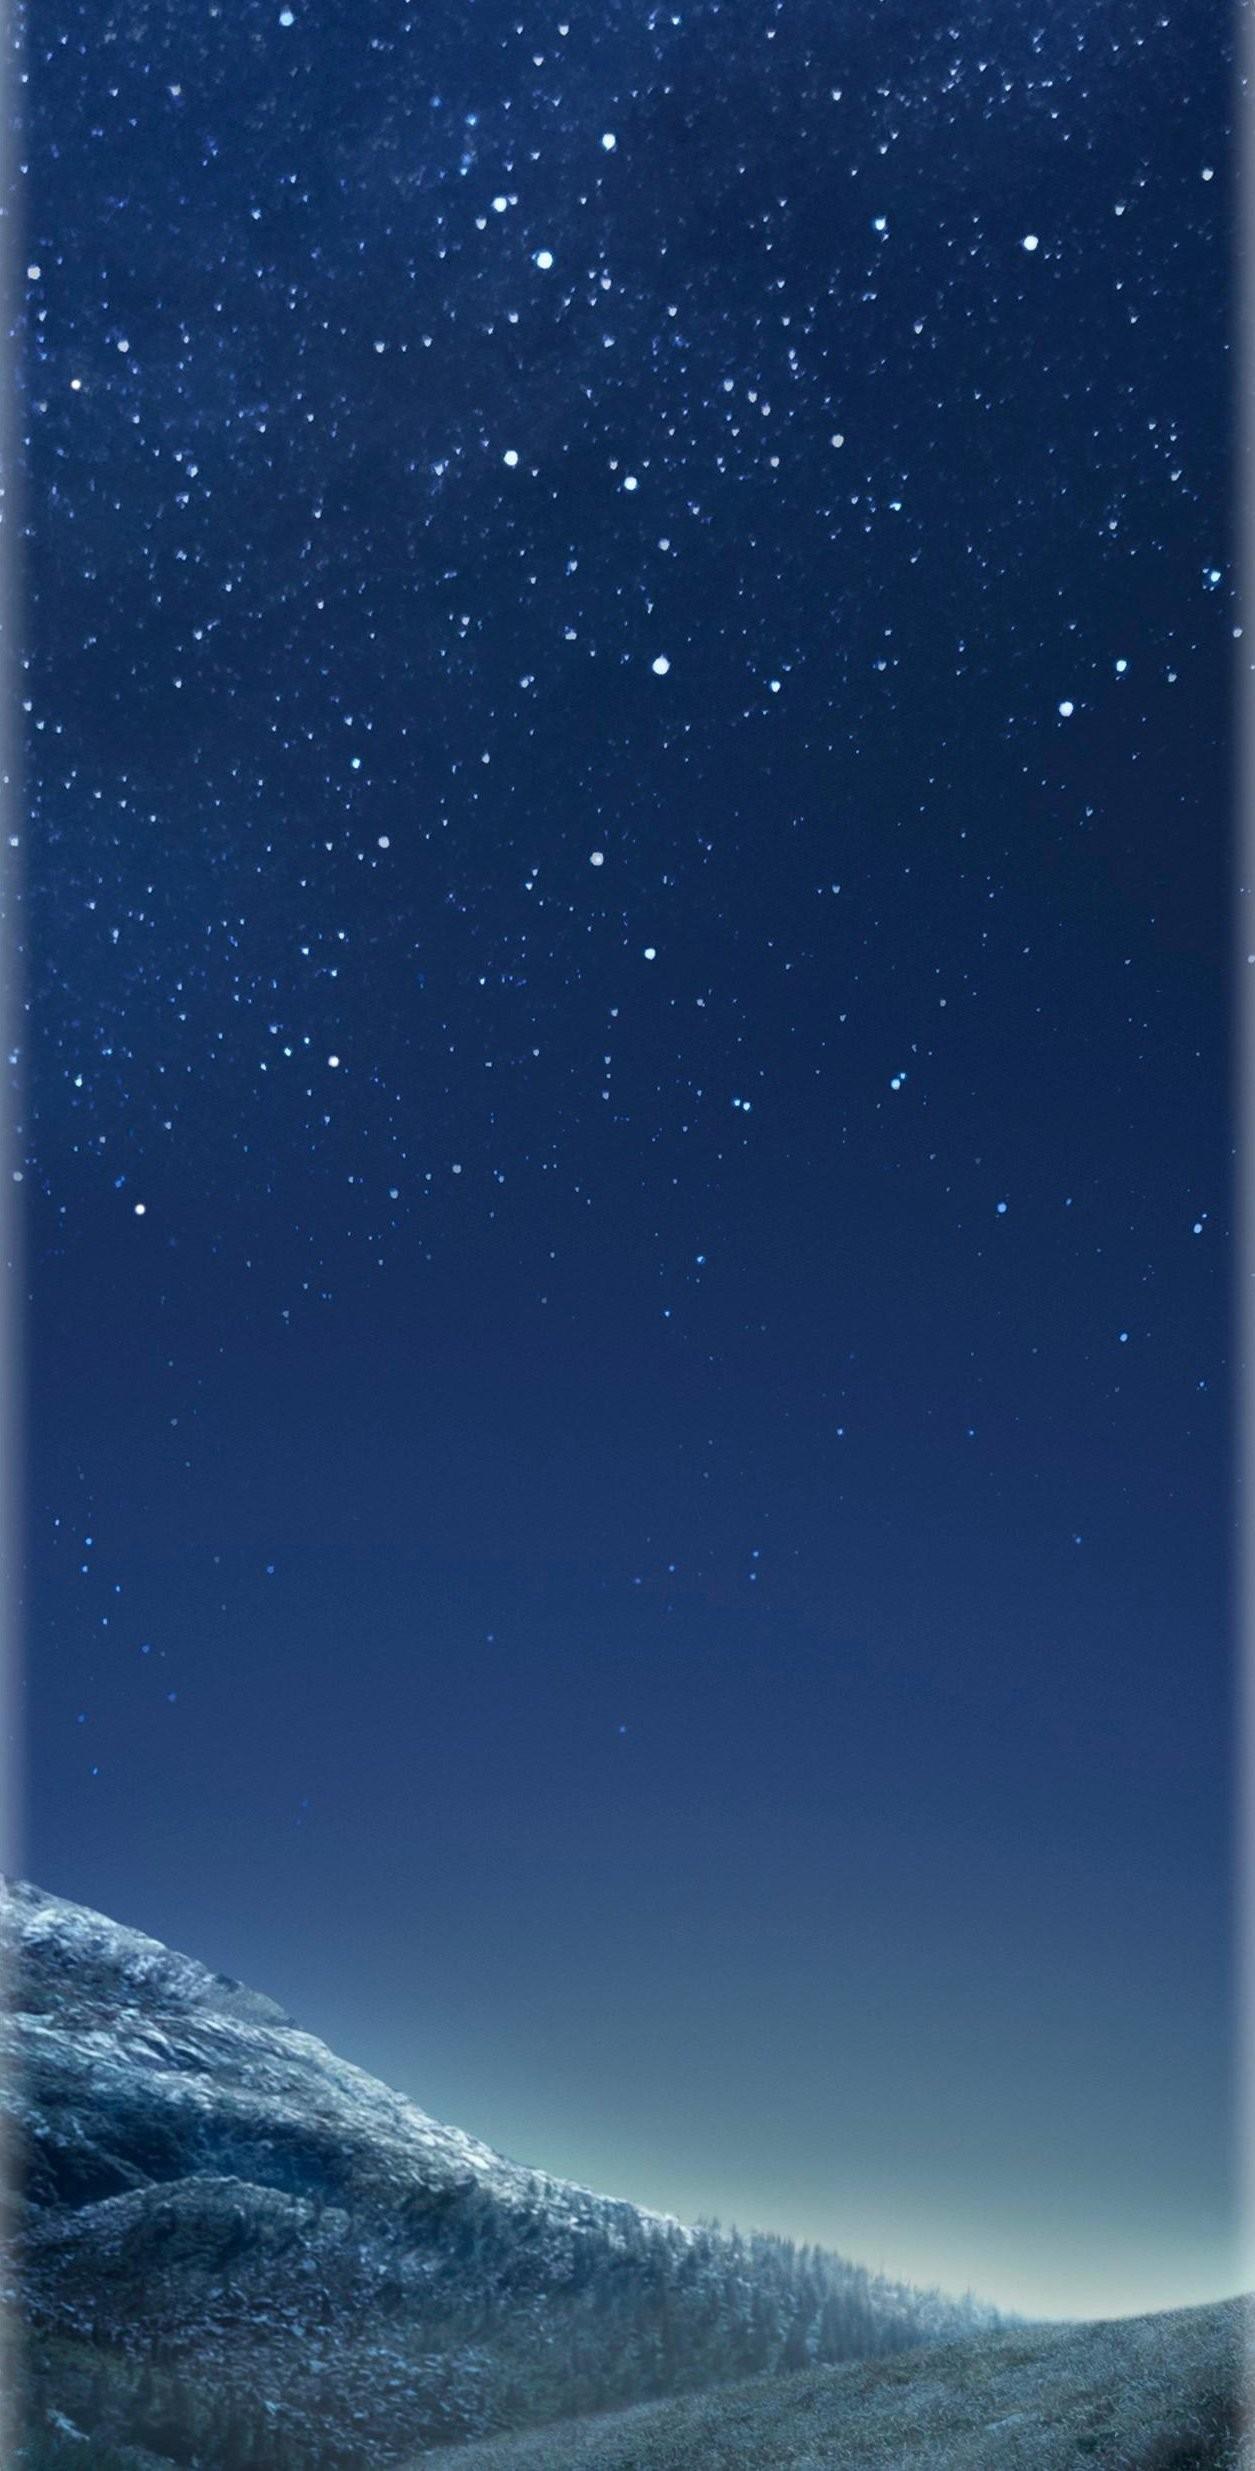 Samsung Galaxy Wallpaper 85+ images